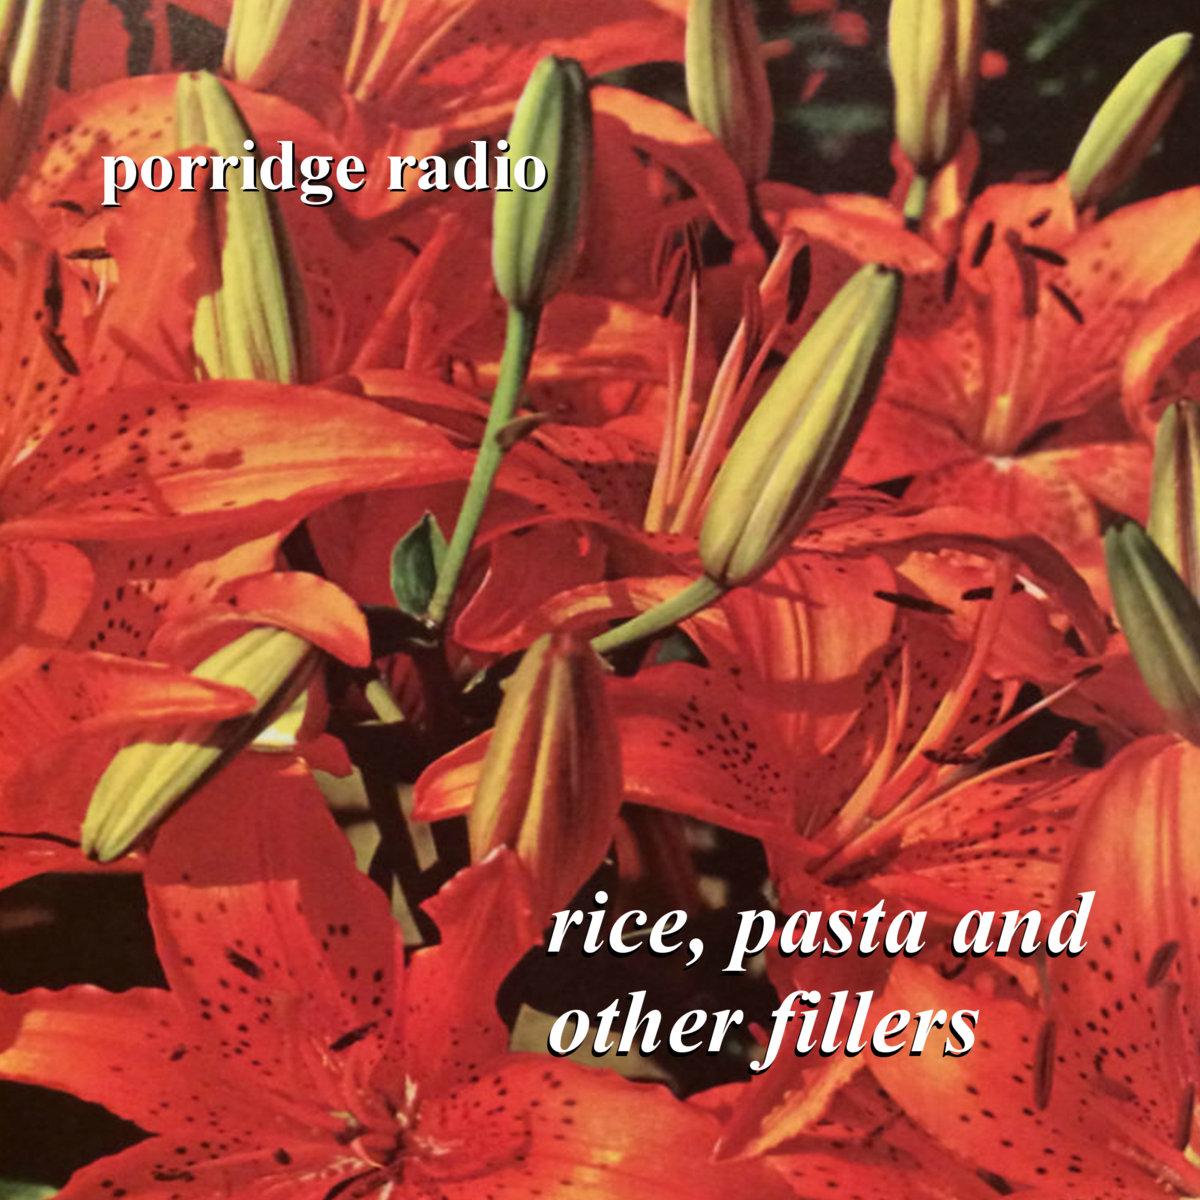 Porridge Radio rice pasta other fillers artwork